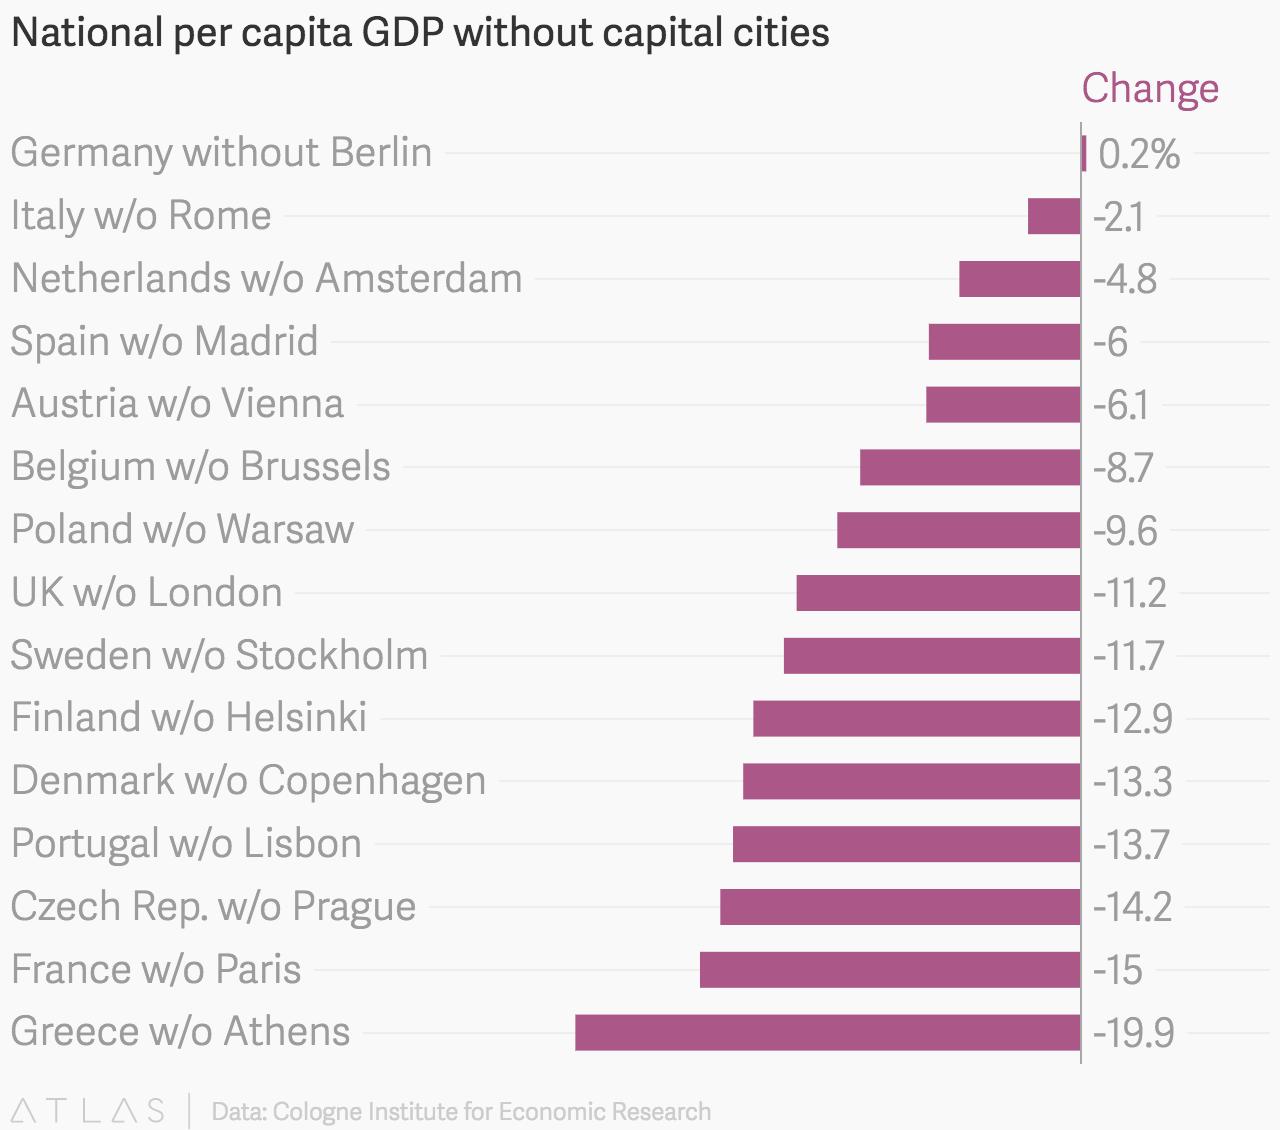 National per capita GDP without capital cities - Atlas